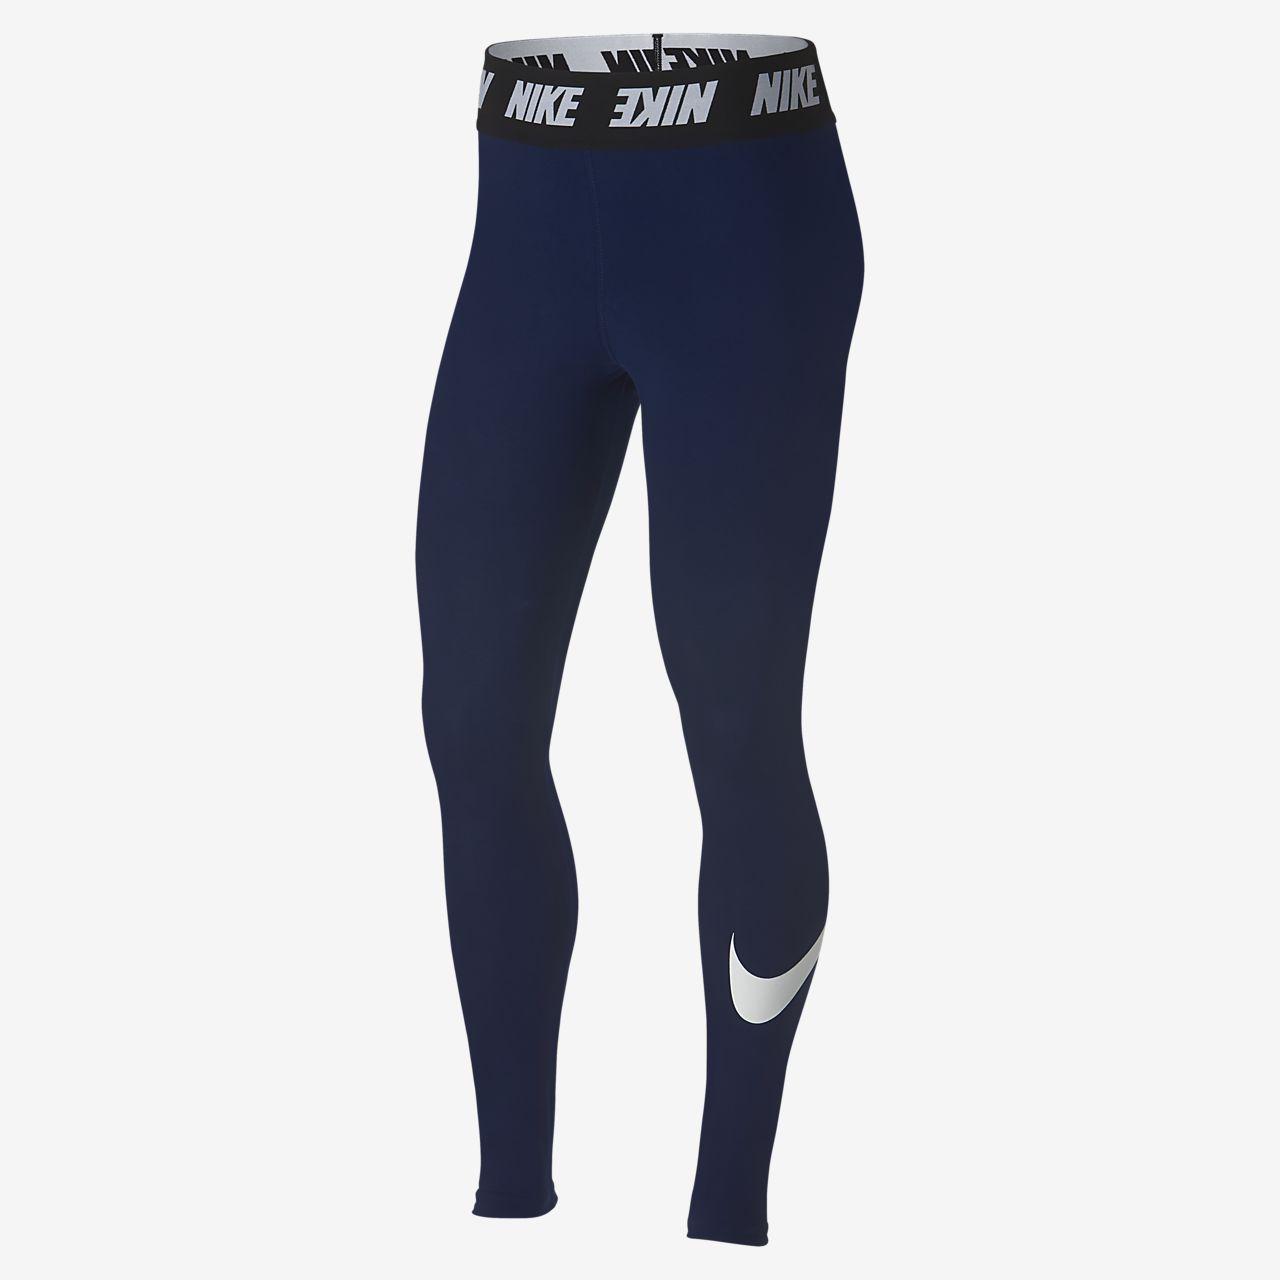 Nike Sportswear Club 女款高腰內搭褲